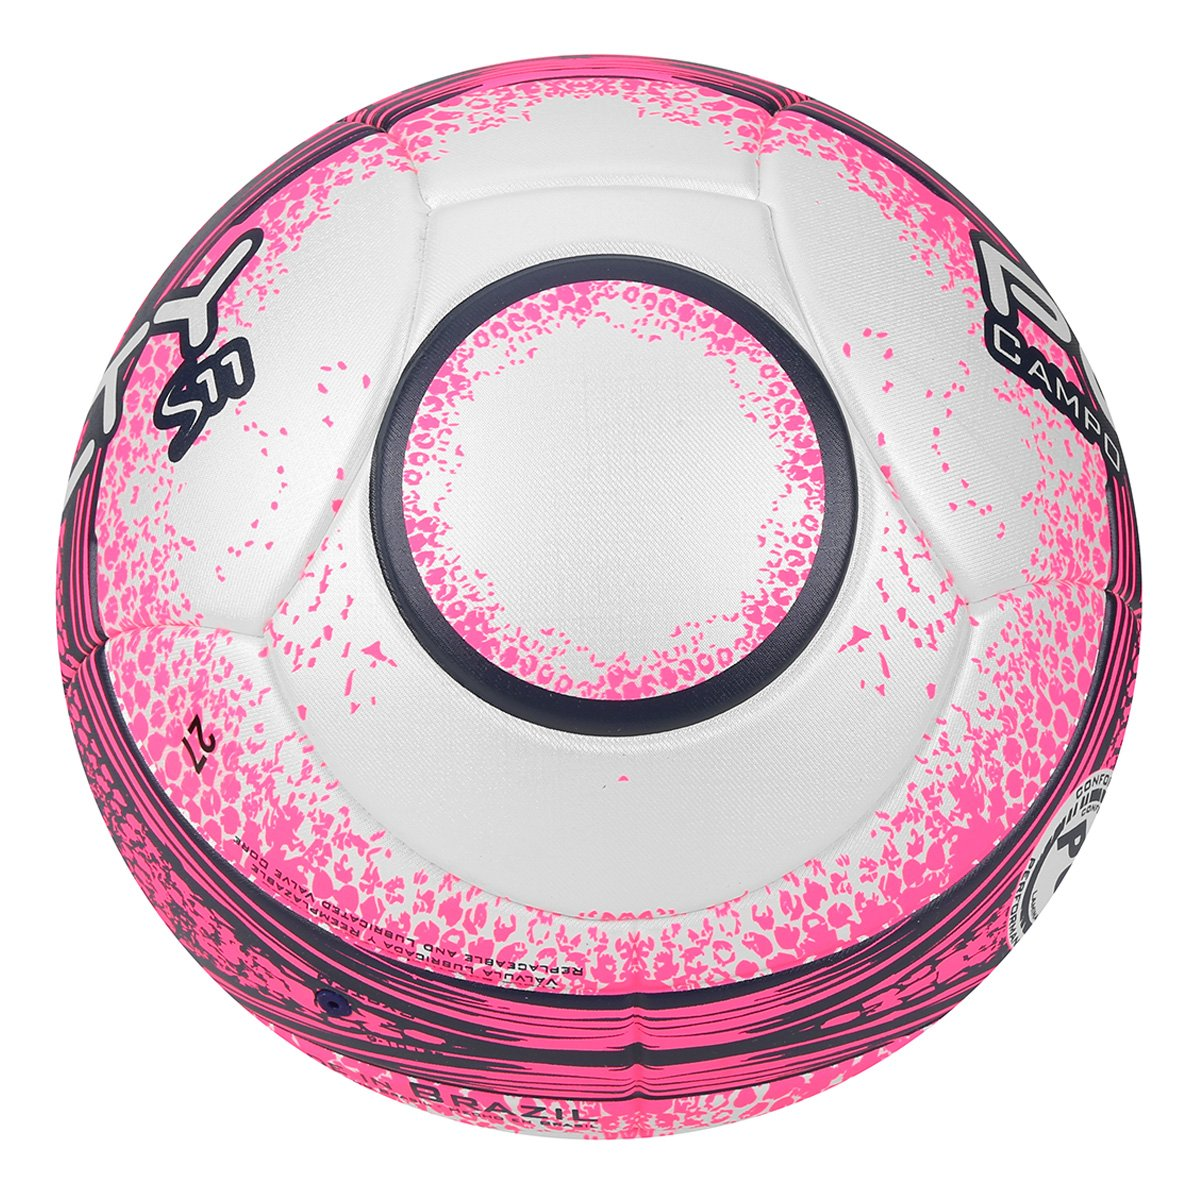 Bola Futebol Campo Penalty S11 R3 Fusion VIII - Branco e Rosa ... eb53bbb21df2a